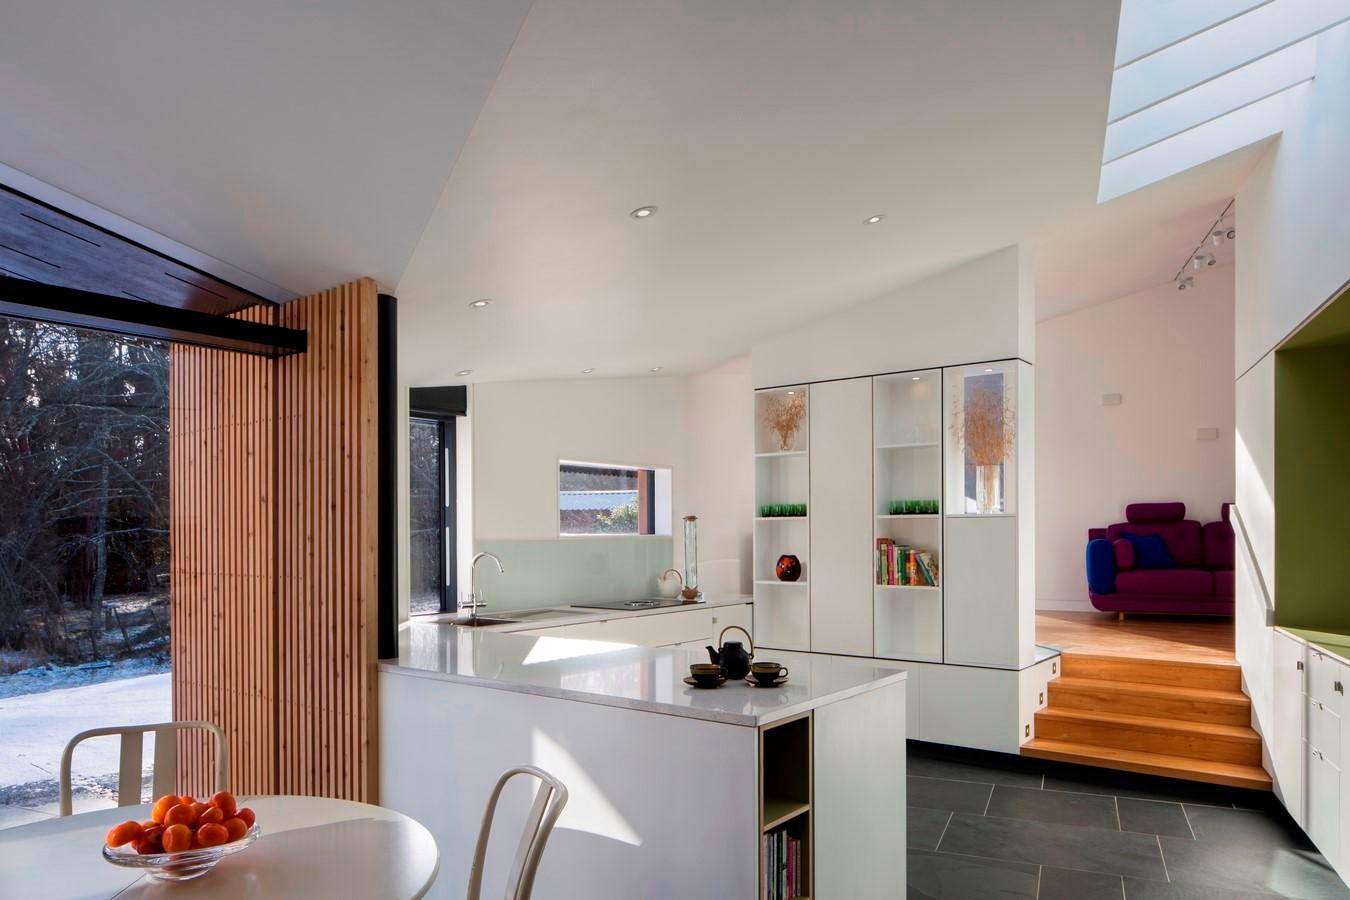 Cairngorm Cottage By WT Architecture - Sheet1